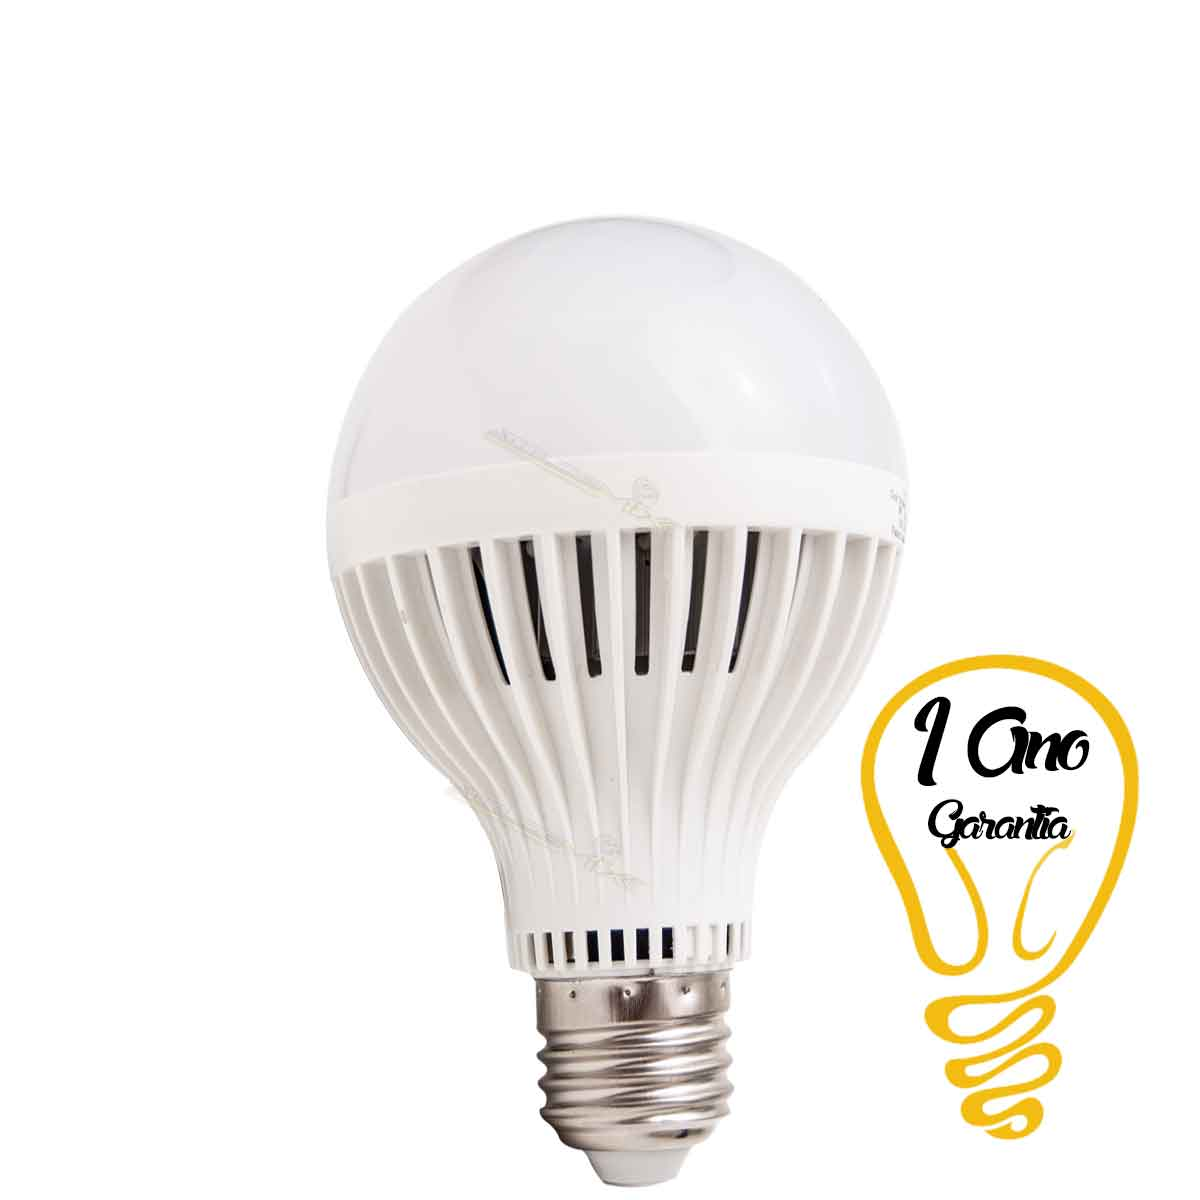 Lâmpada LED 9W E27 Bulbo Bi-Volt 90% Mais Econômico